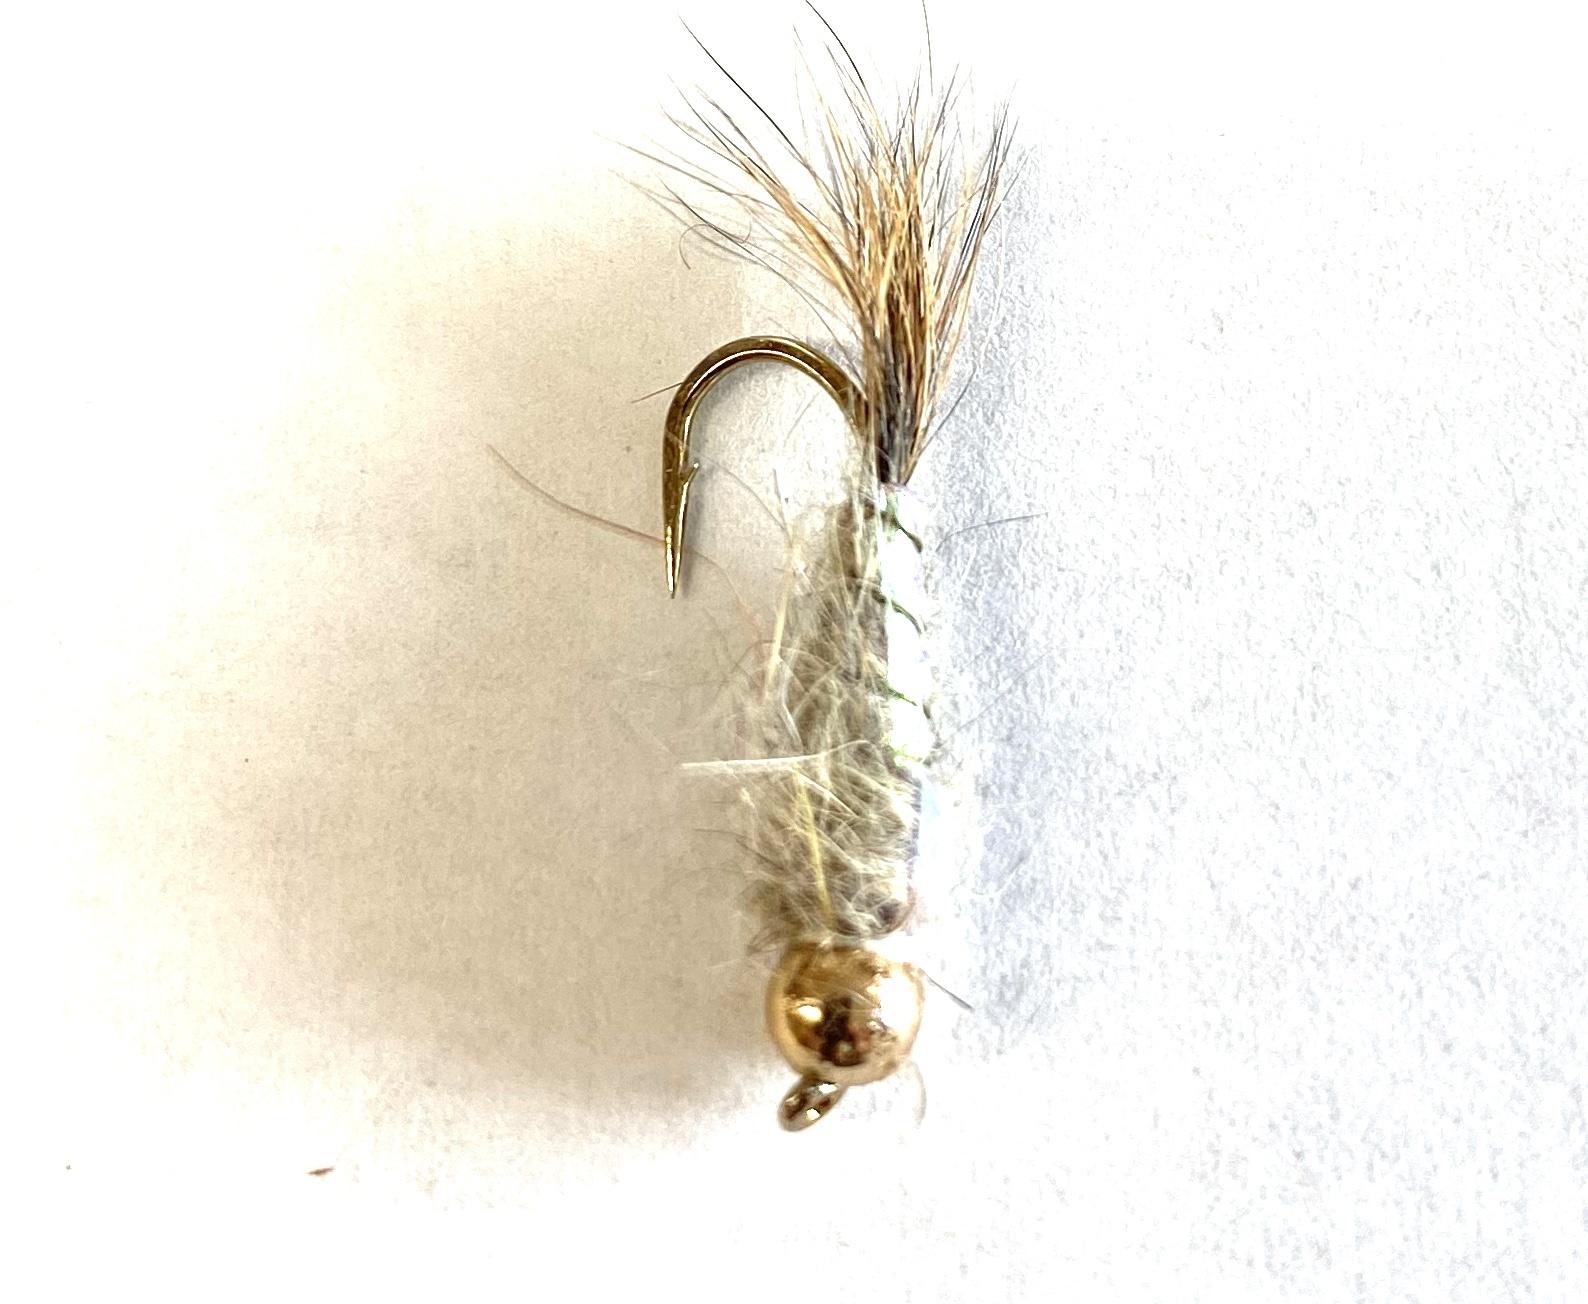 Fulling Mill Tungsten Head Hare's Ear Flashback